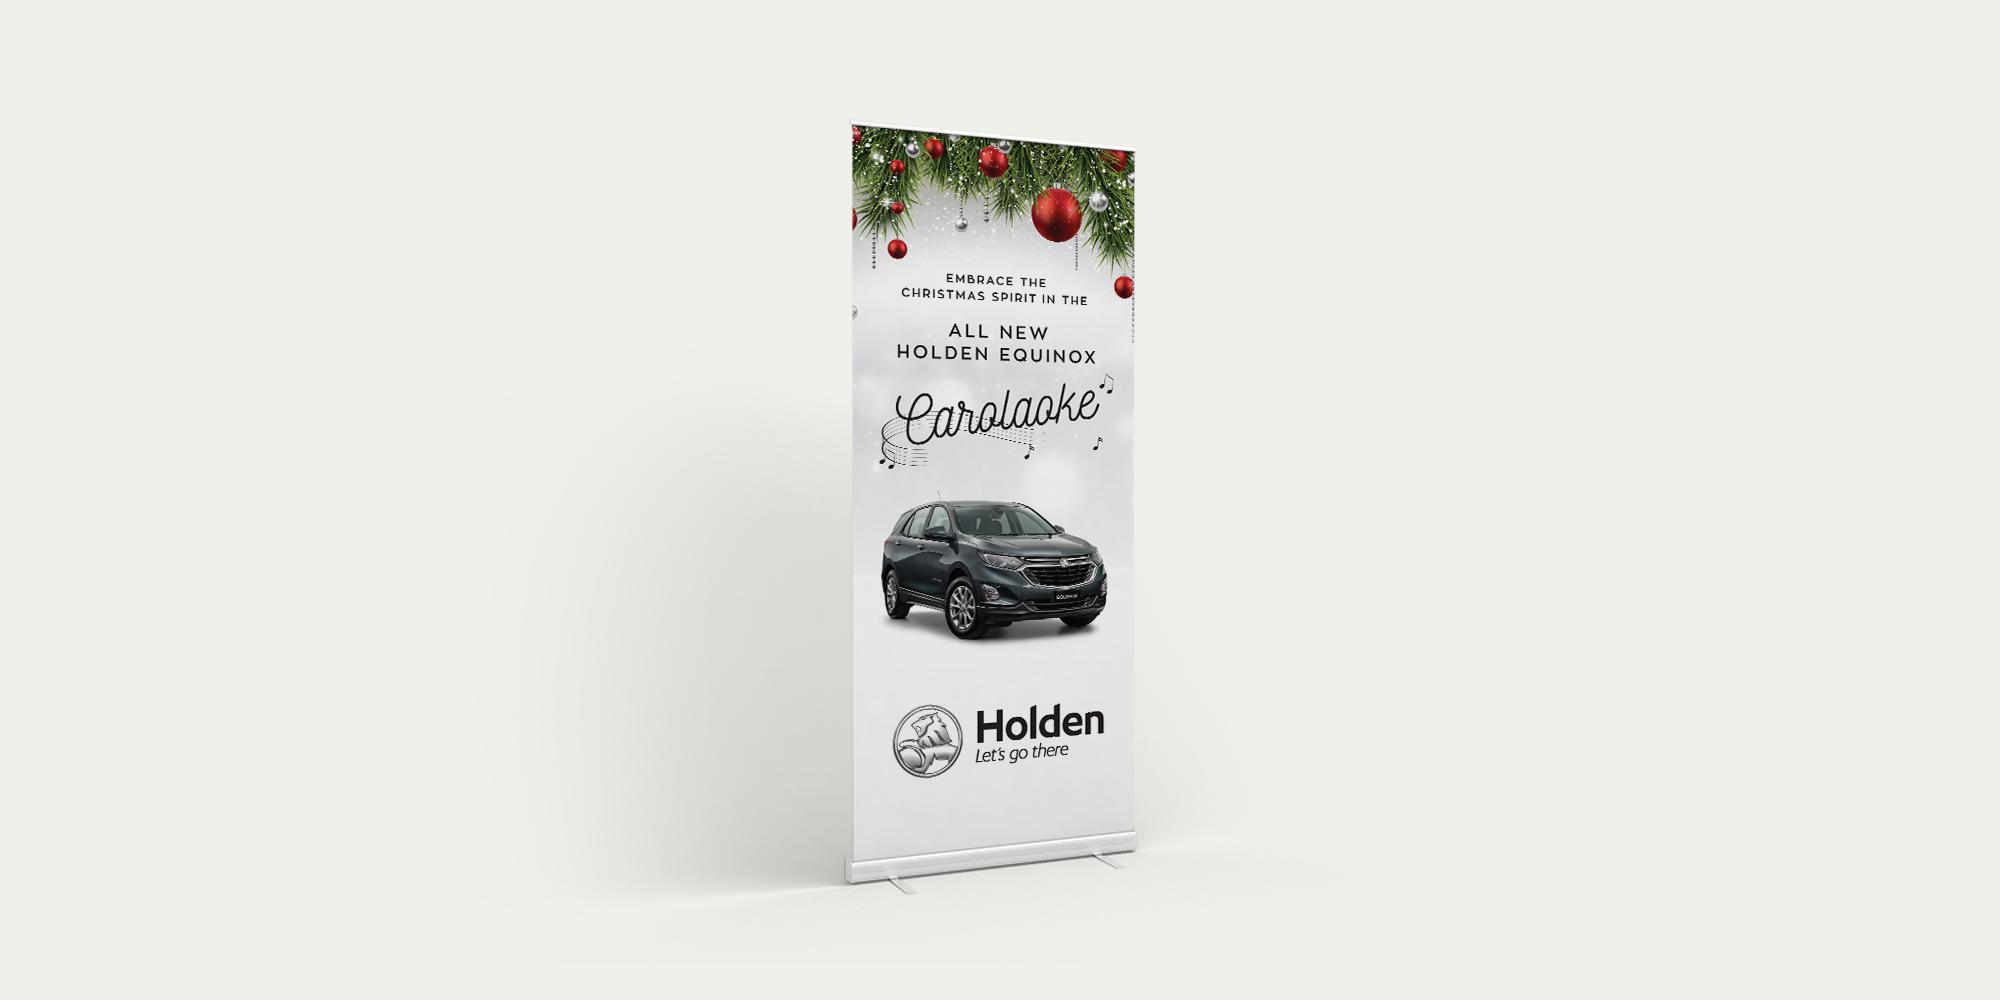 Holden Caraloake Banner